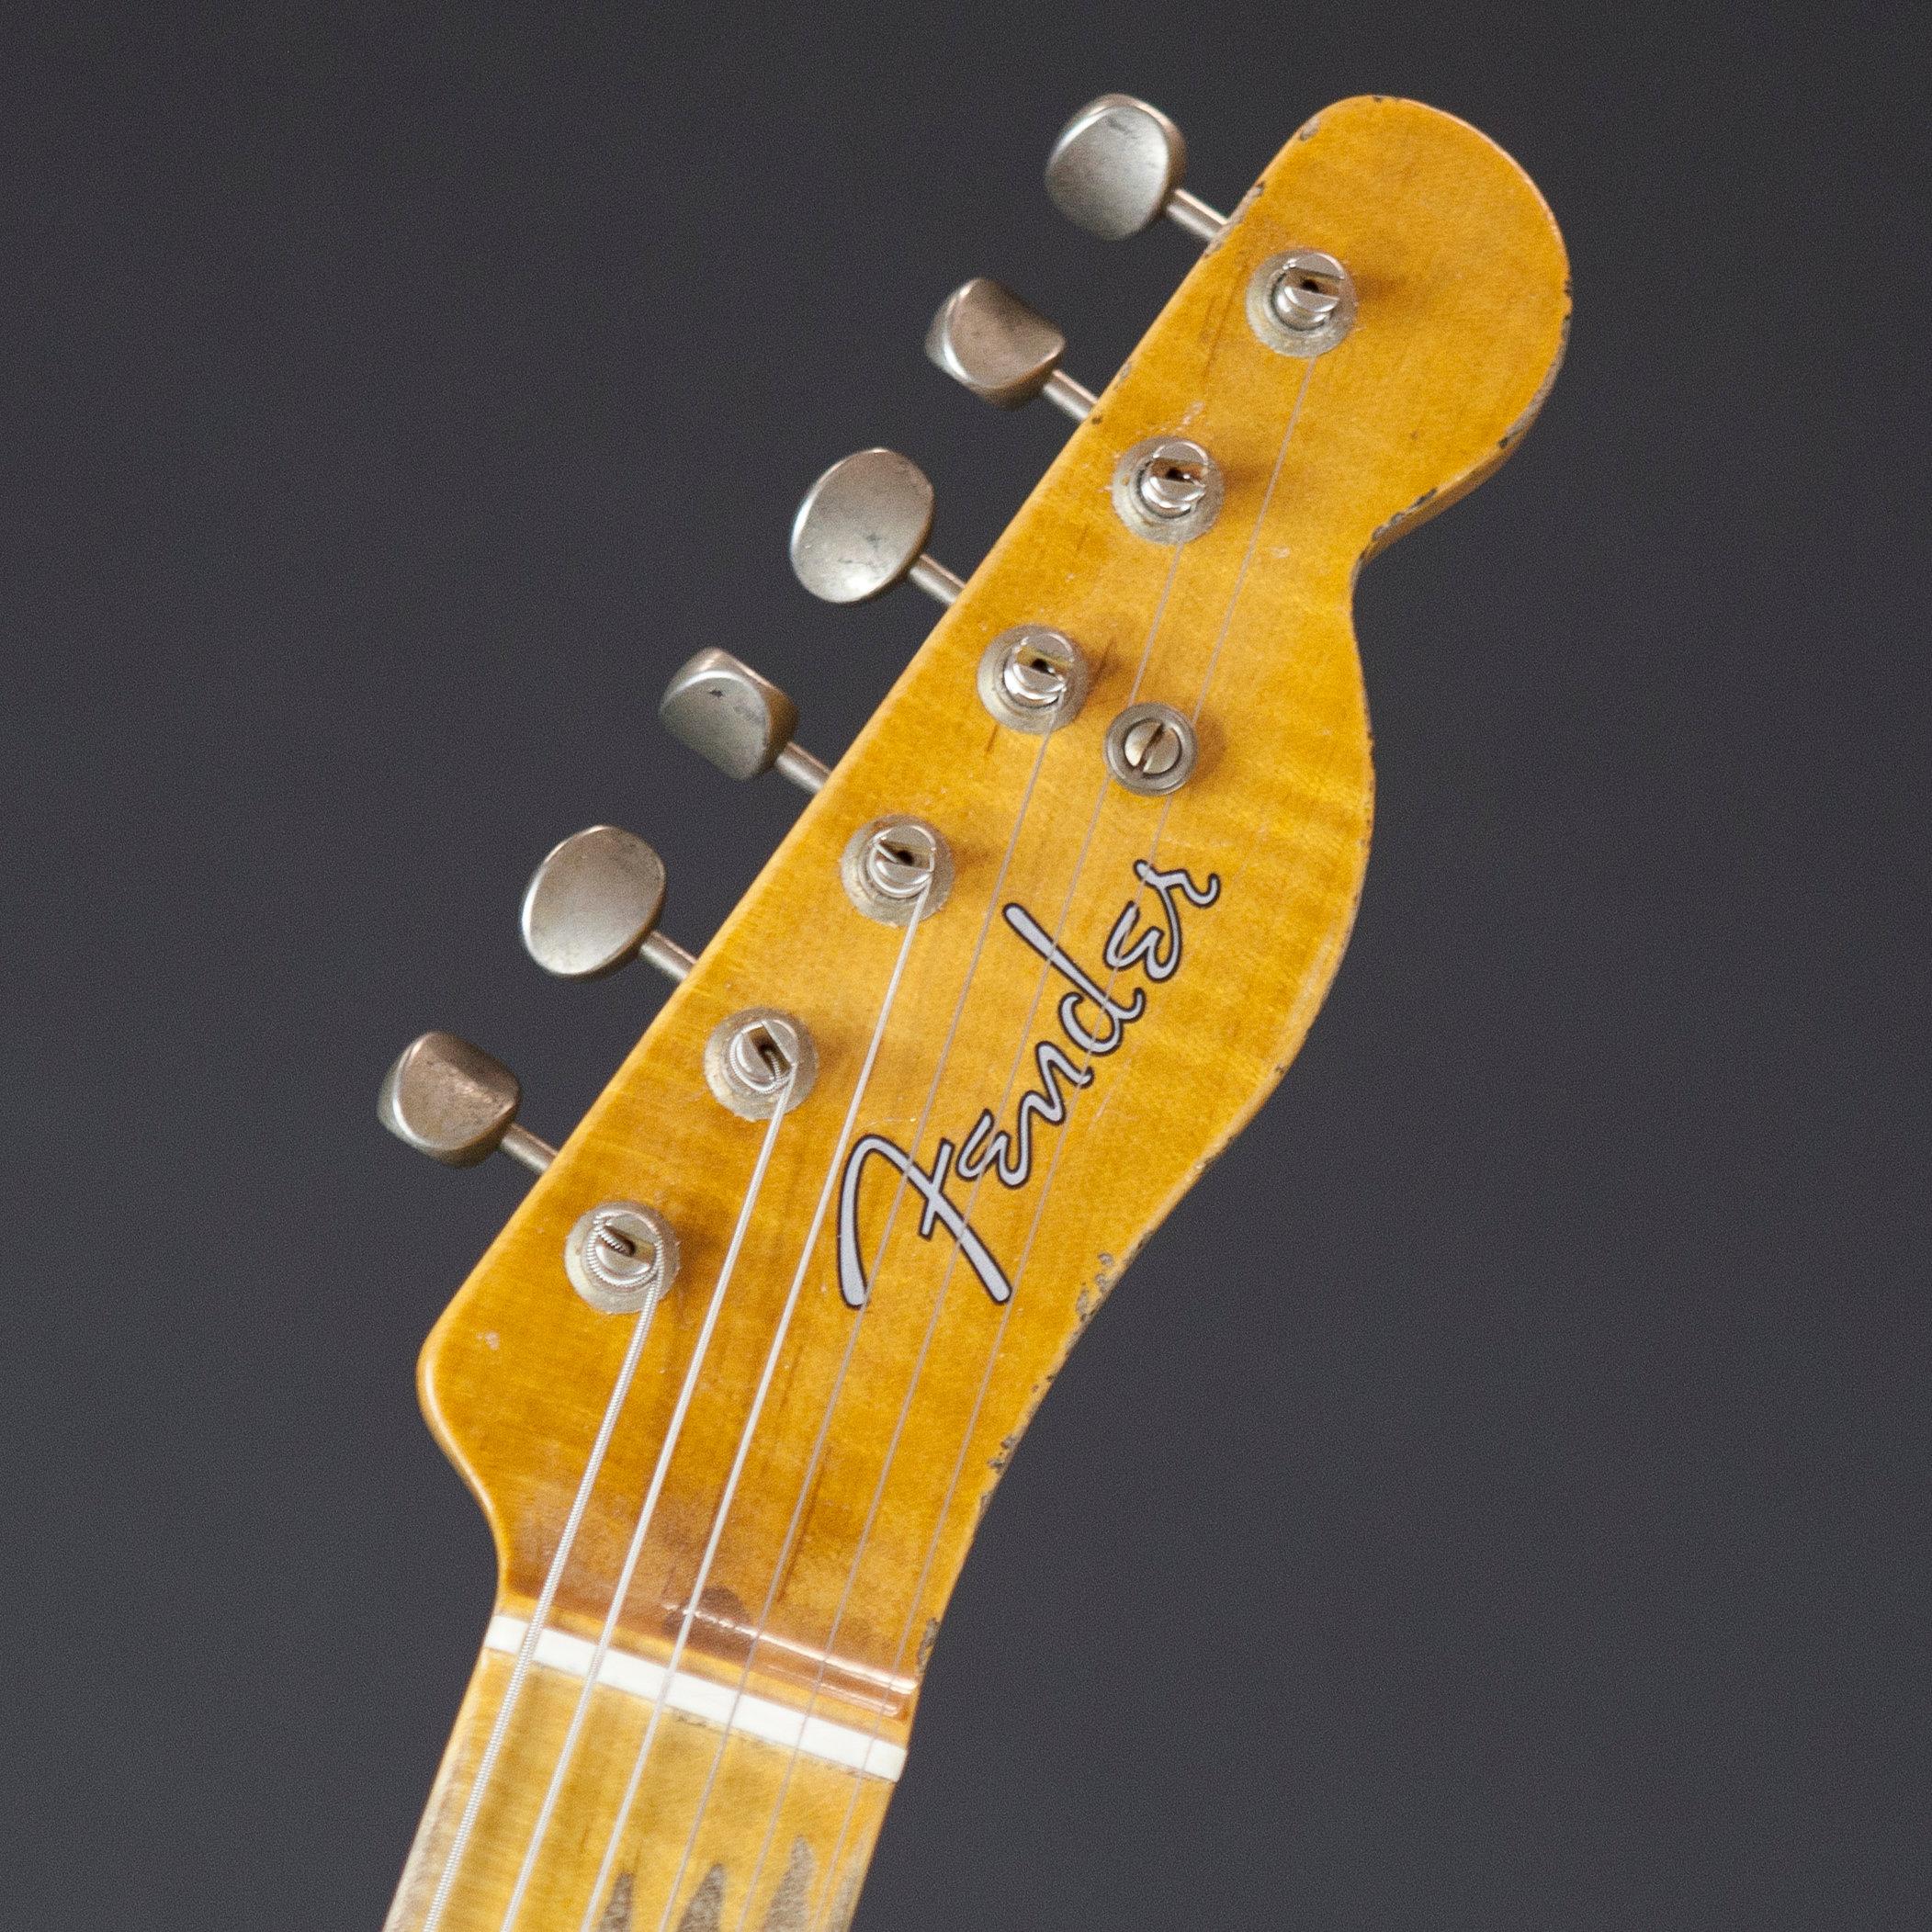 fender custom shop 1951 nocaster heavy relic 2018 faded nocaster blonde miami guitars. Black Bedroom Furniture Sets. Home Design Ideas